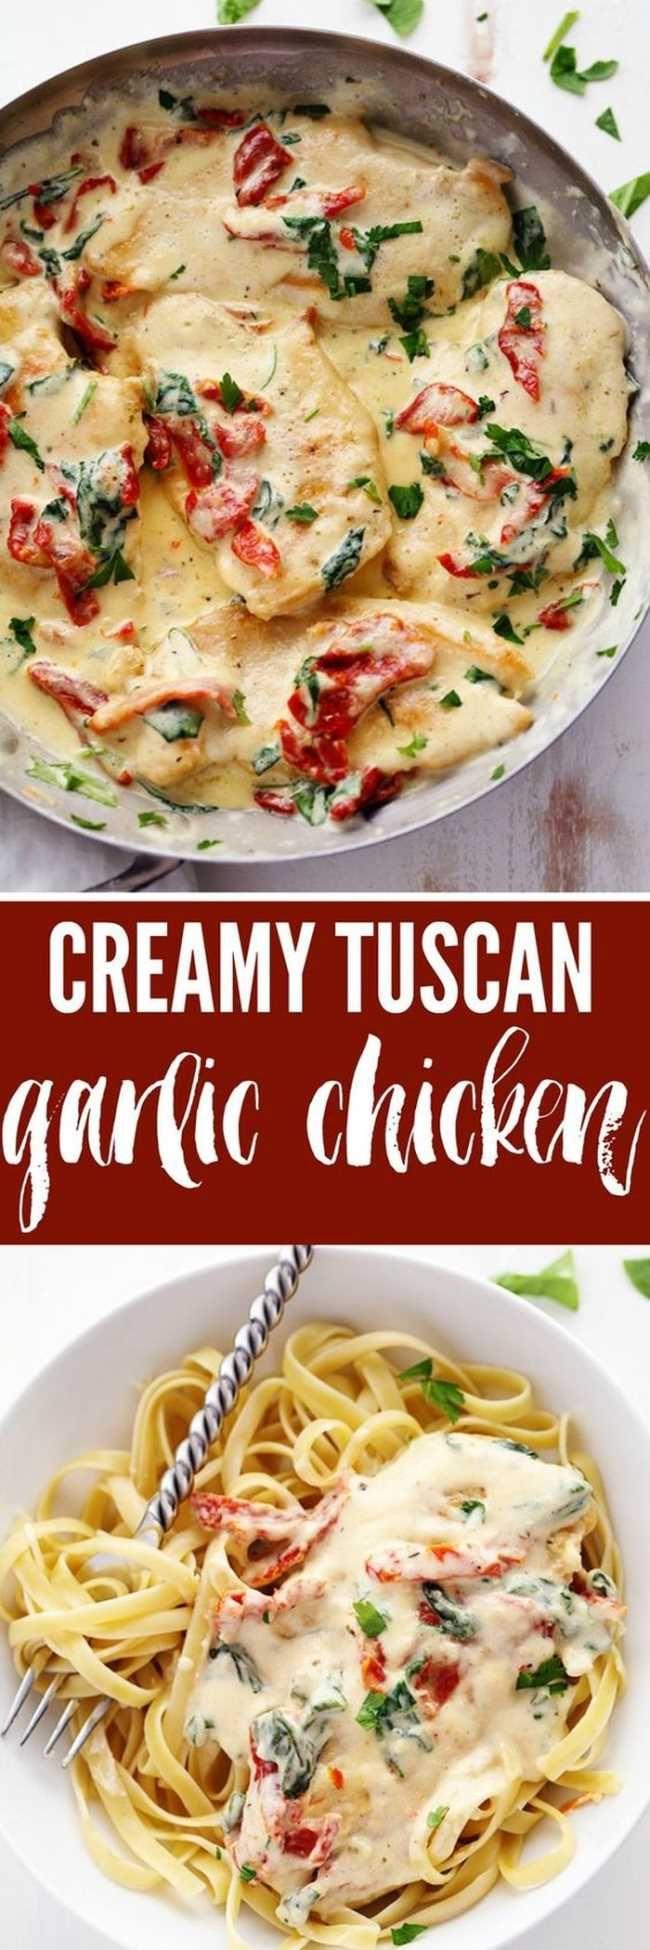 20-delicious-italian-recipies-001